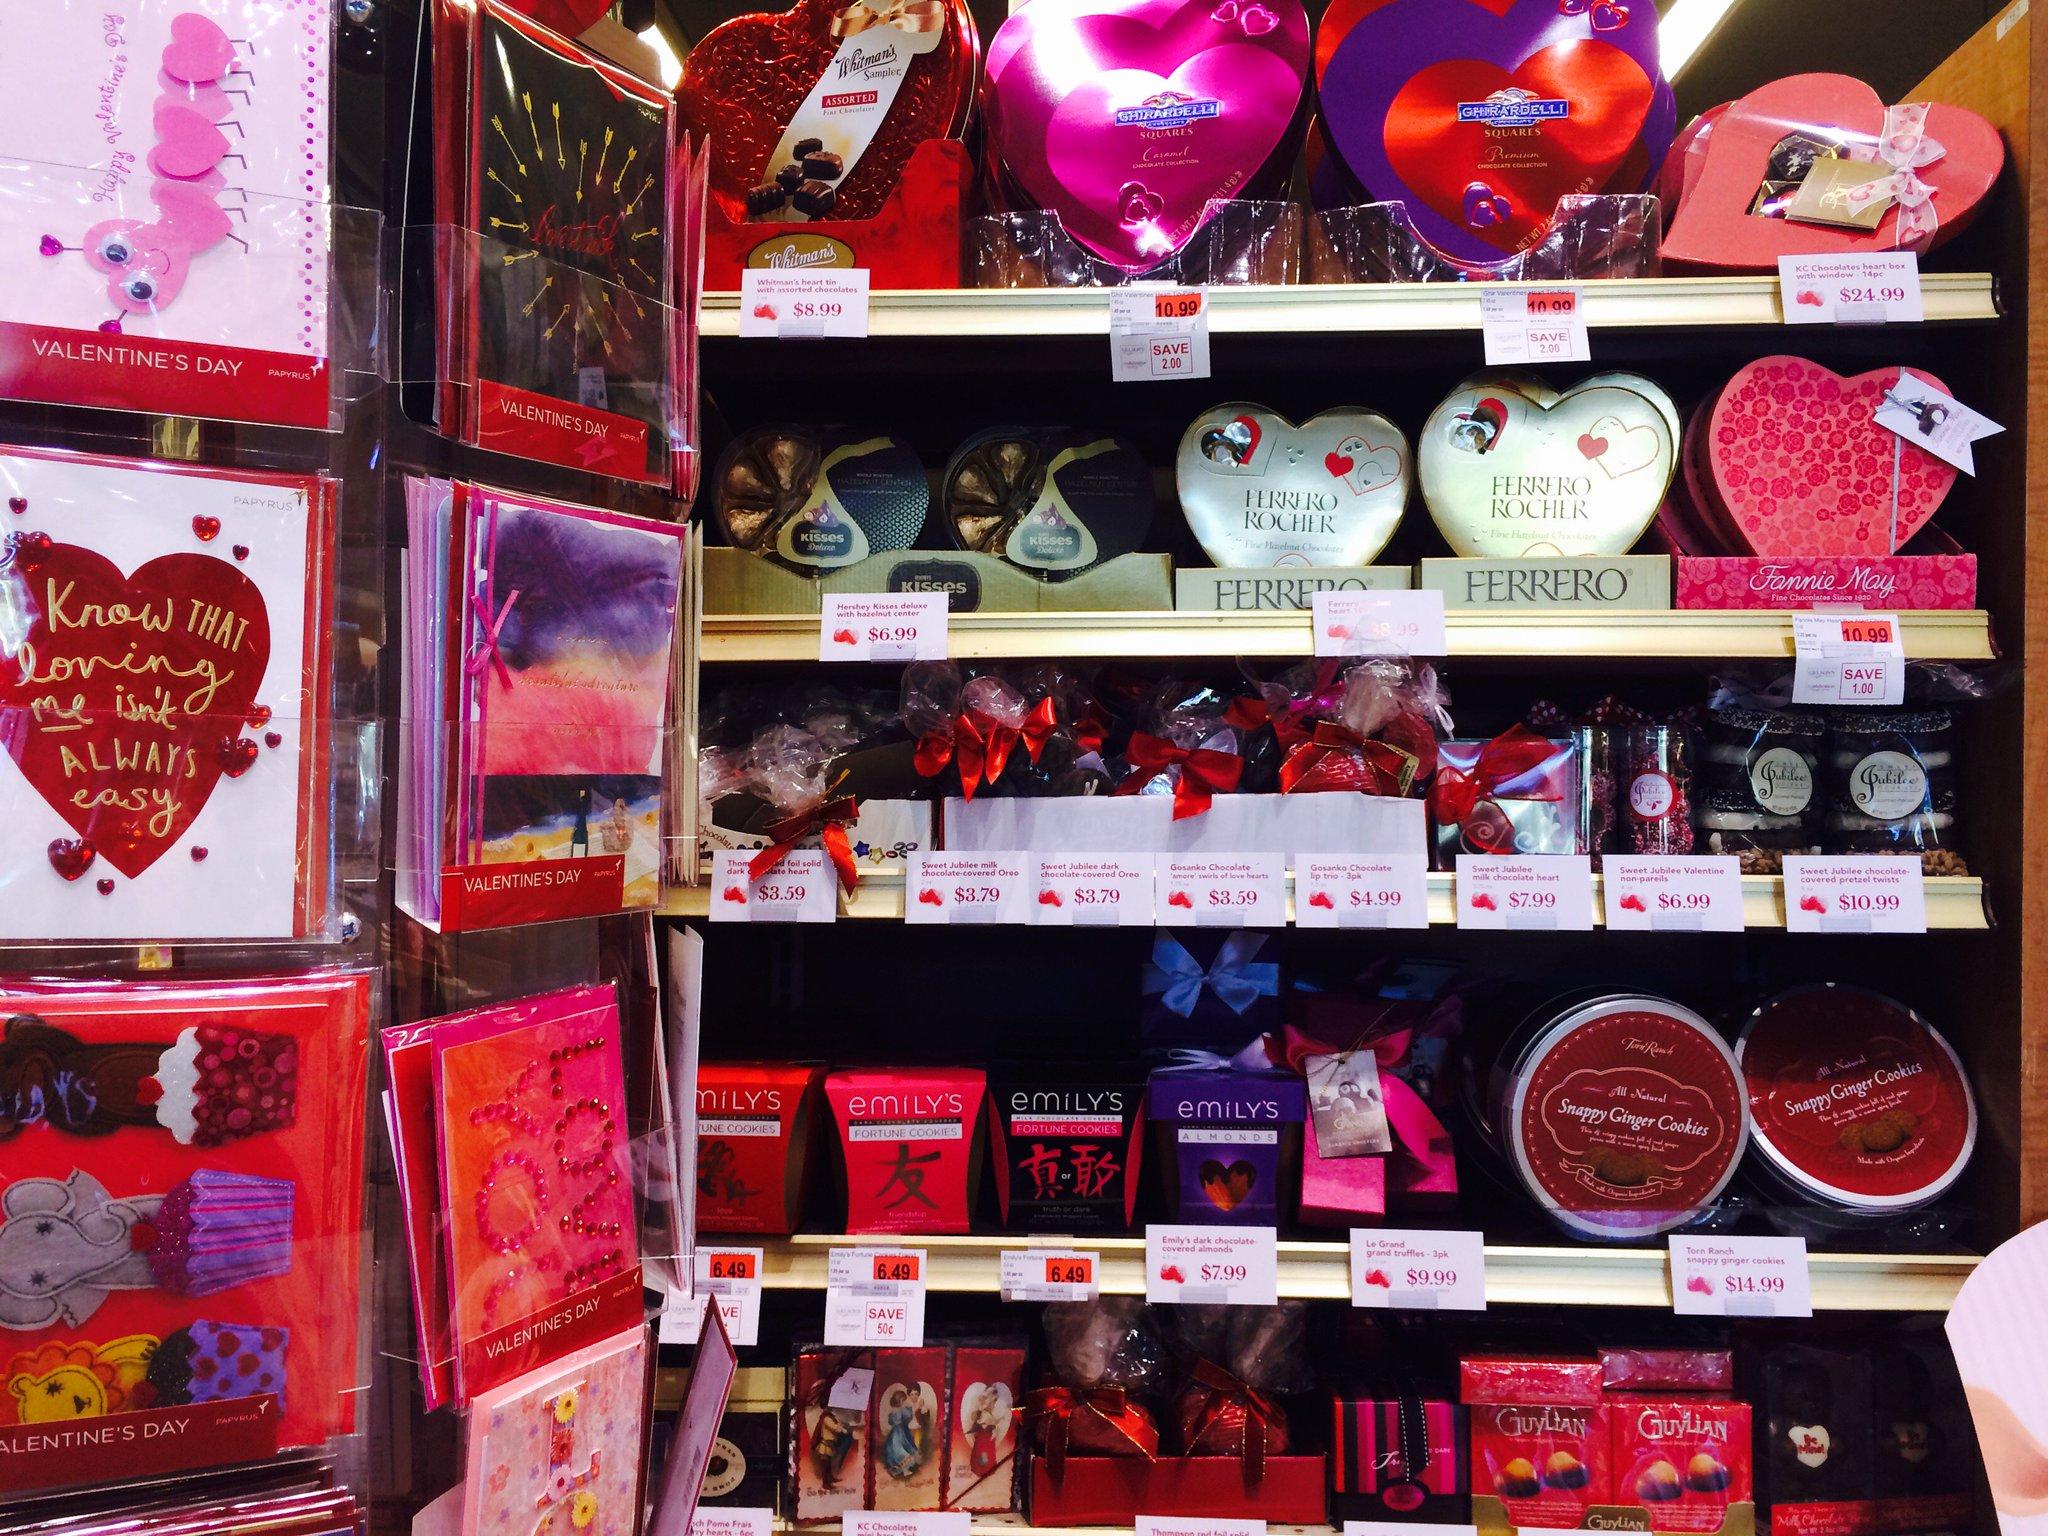 #ValentinesDay is definitely on it's way then ... https://t.co/EZXQXCqjJE